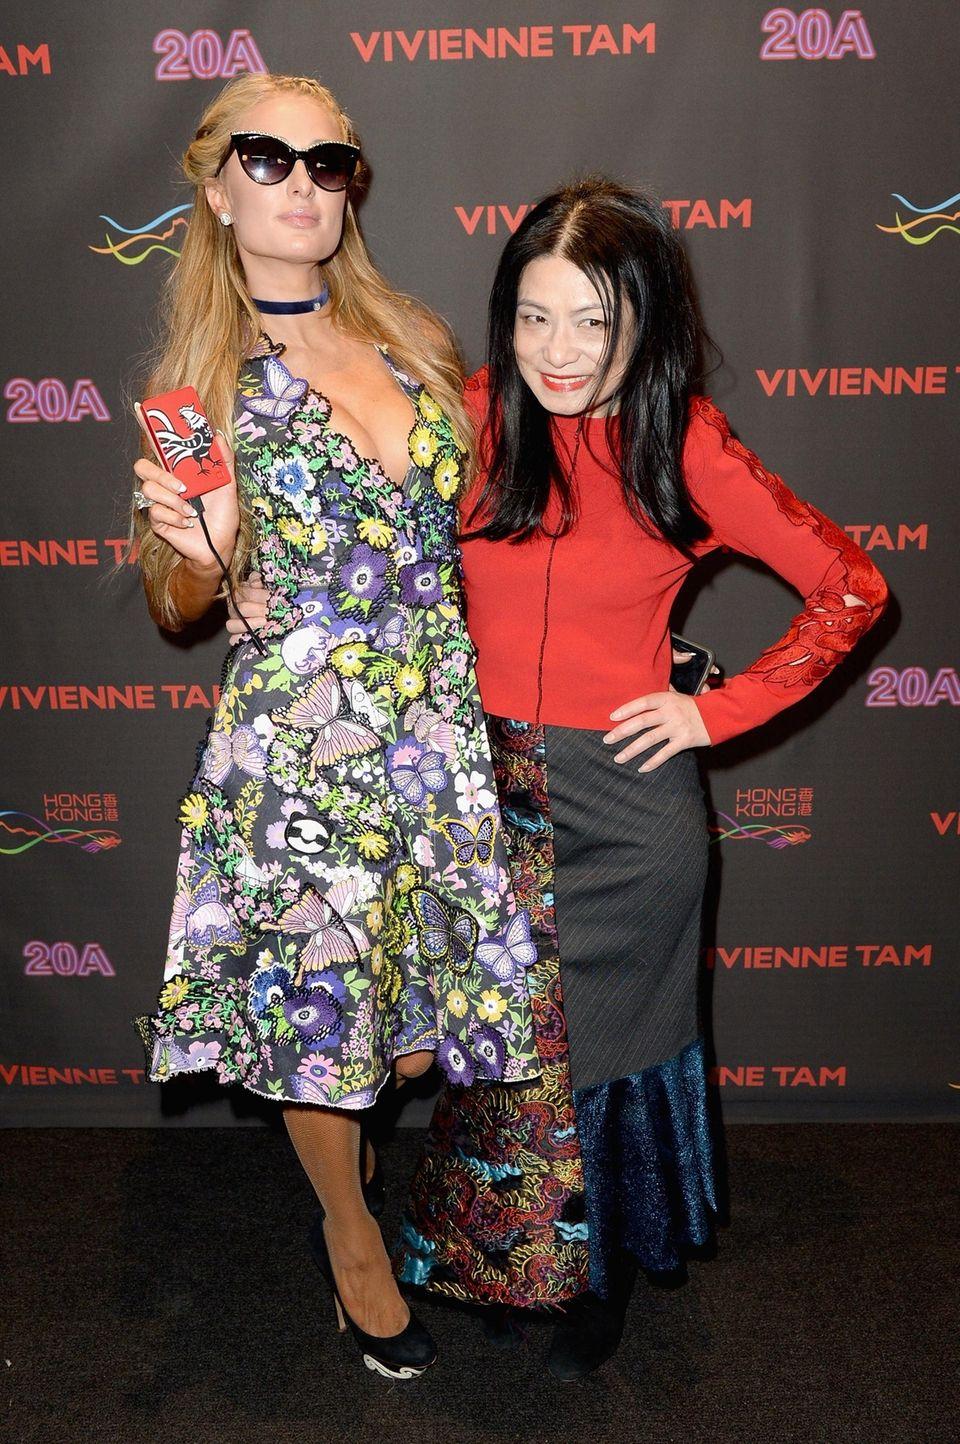 Paris Hilton poses with Vivienne Tam at the